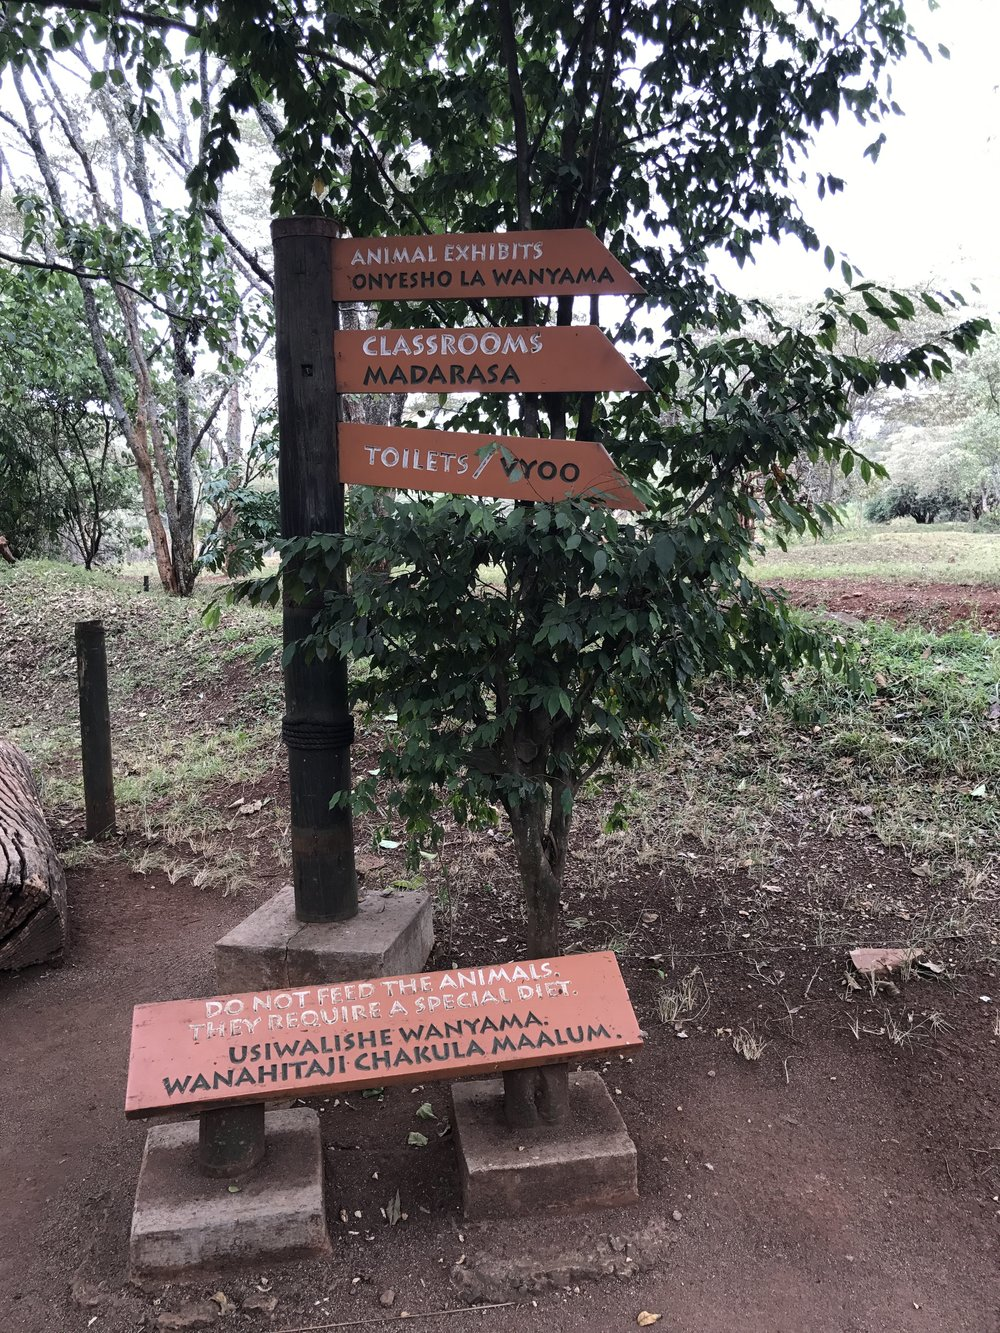 More Swahili/English signs